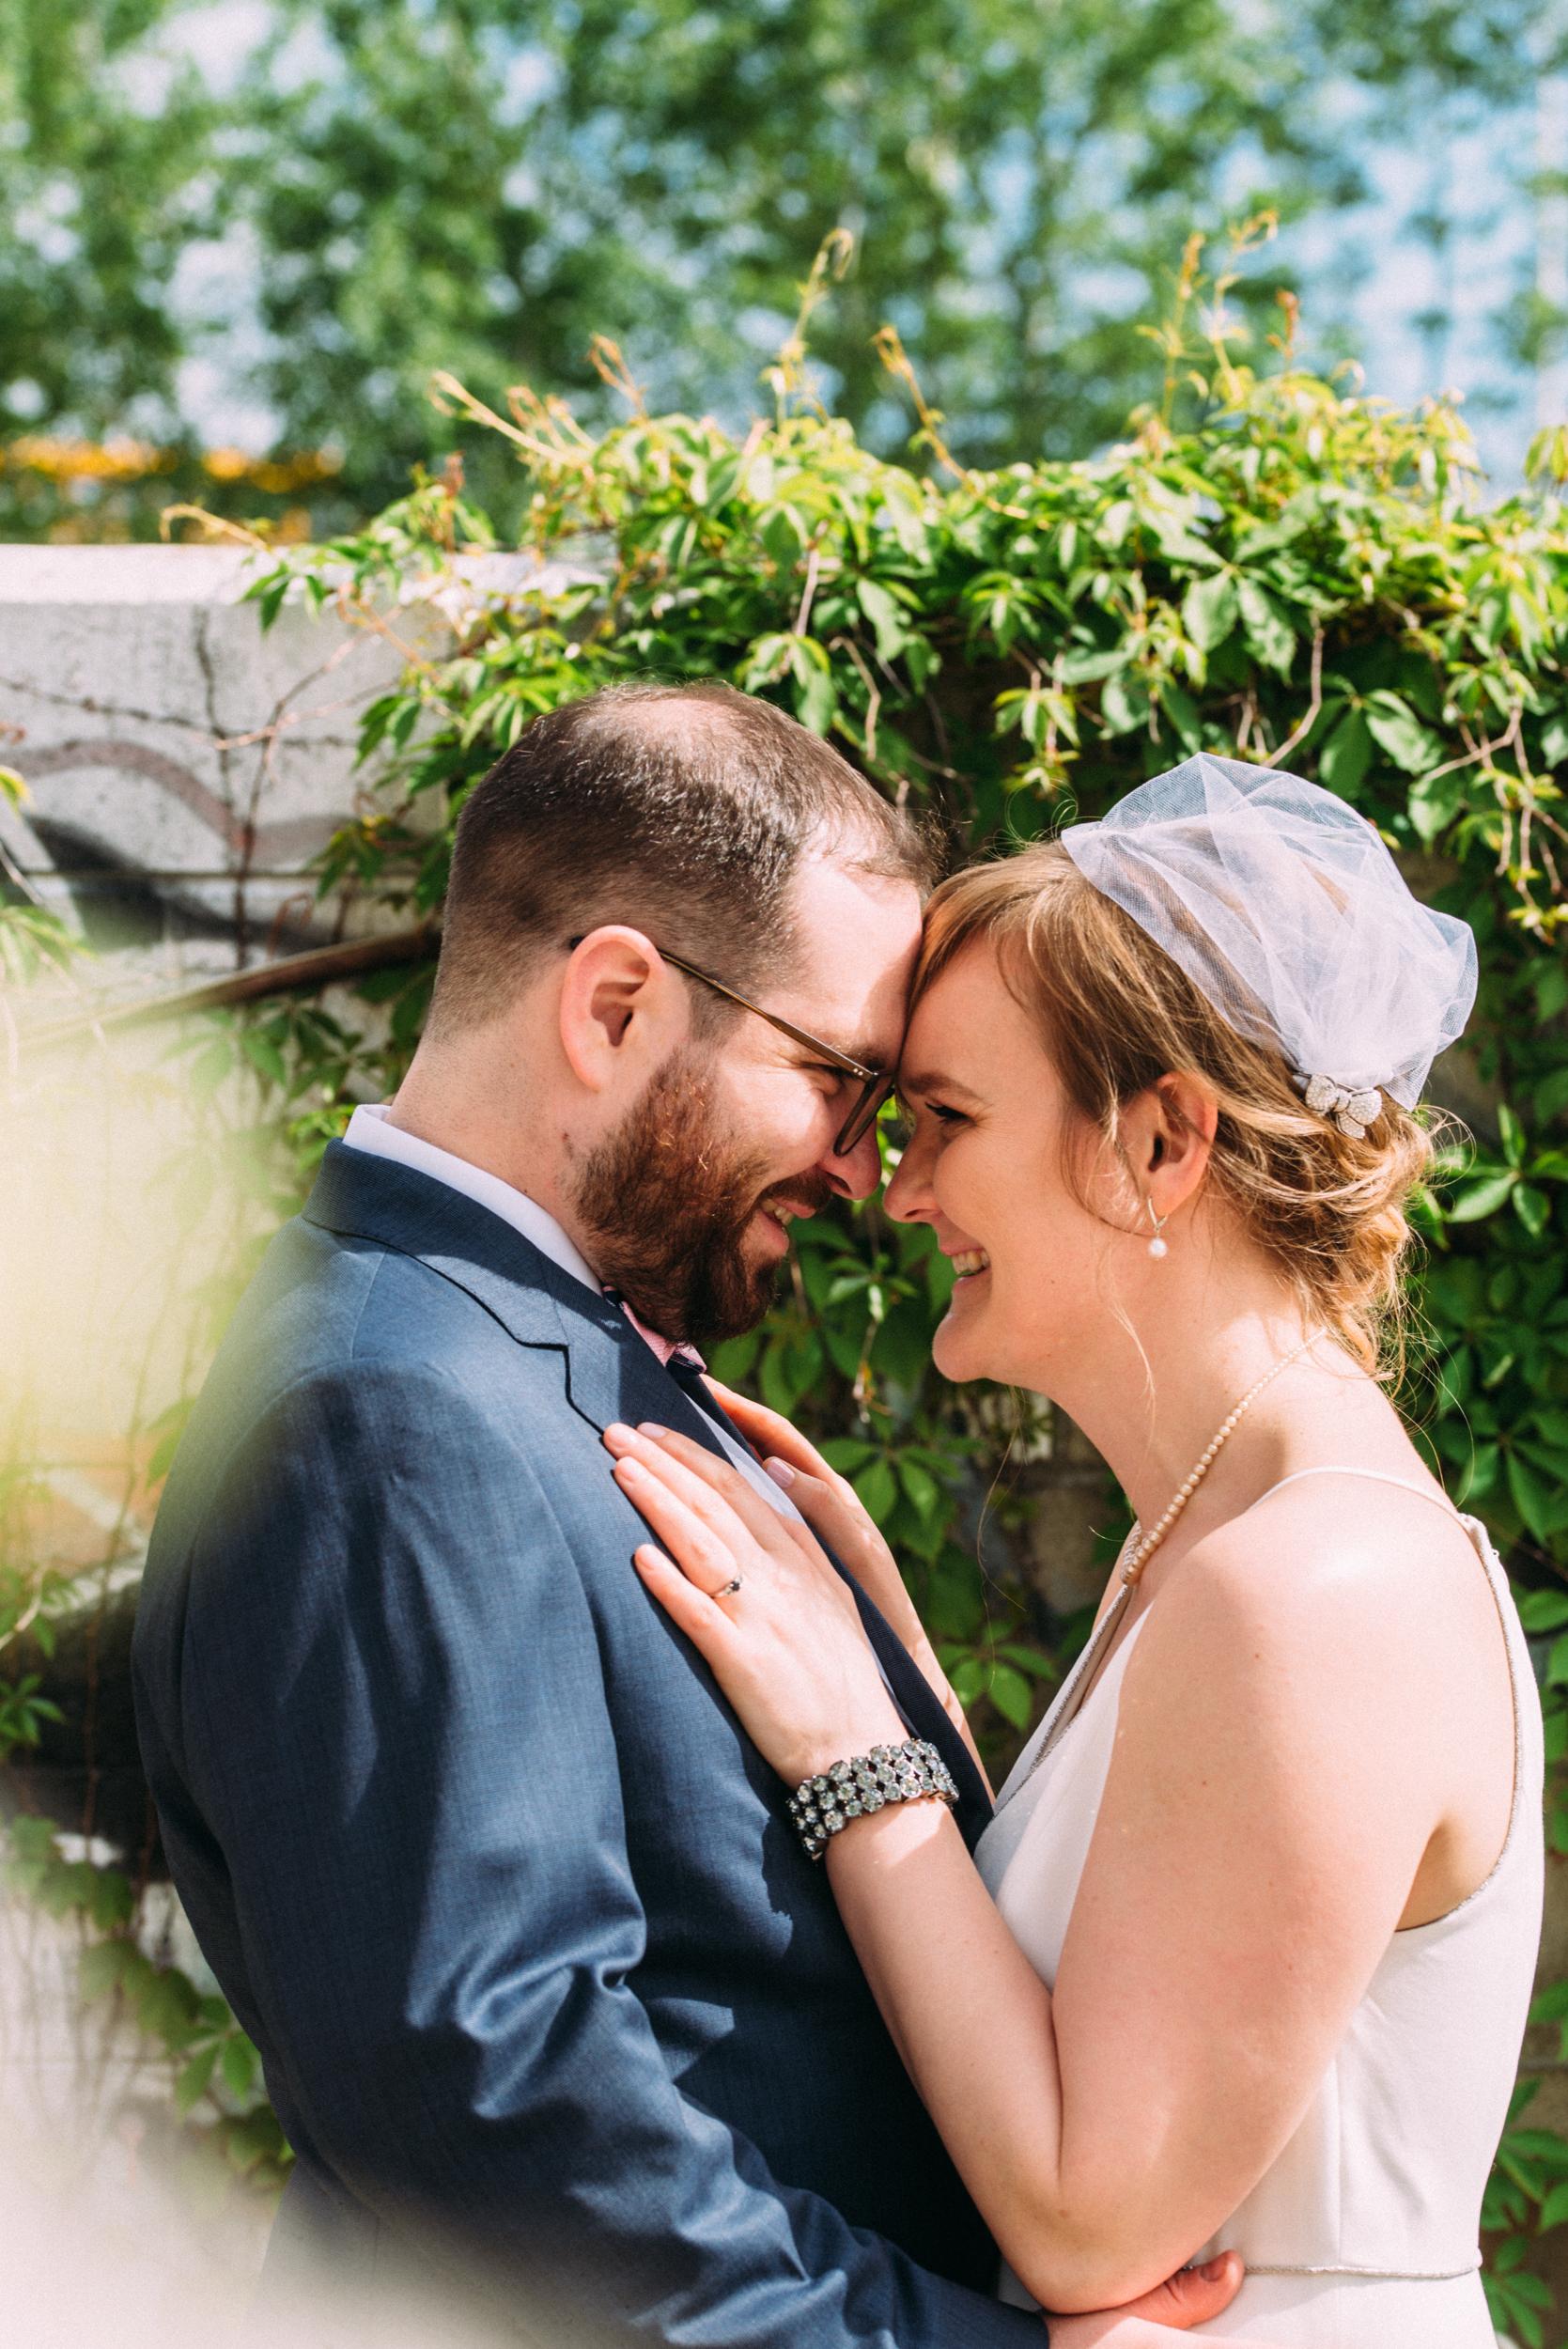 Bride and Groom Toronto Wedding at Airship 37 with Soundslikeyellowphotography